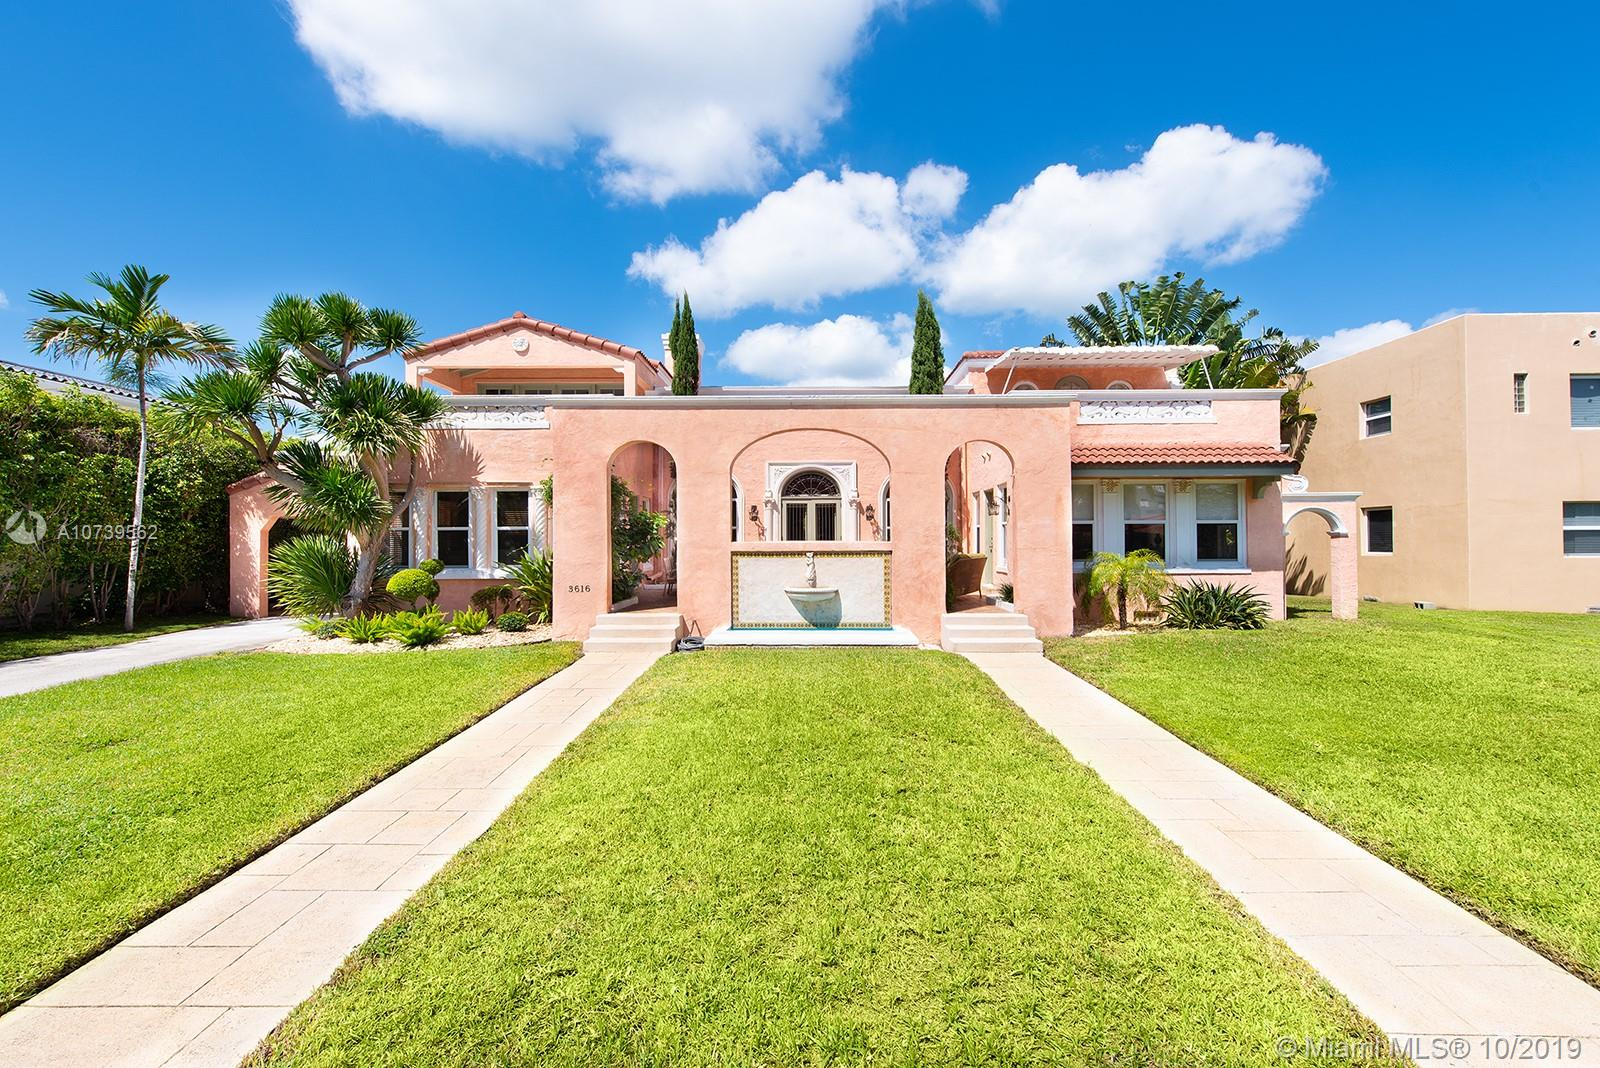 3616 Flamingo Dr, Miami Beach, FL 33140